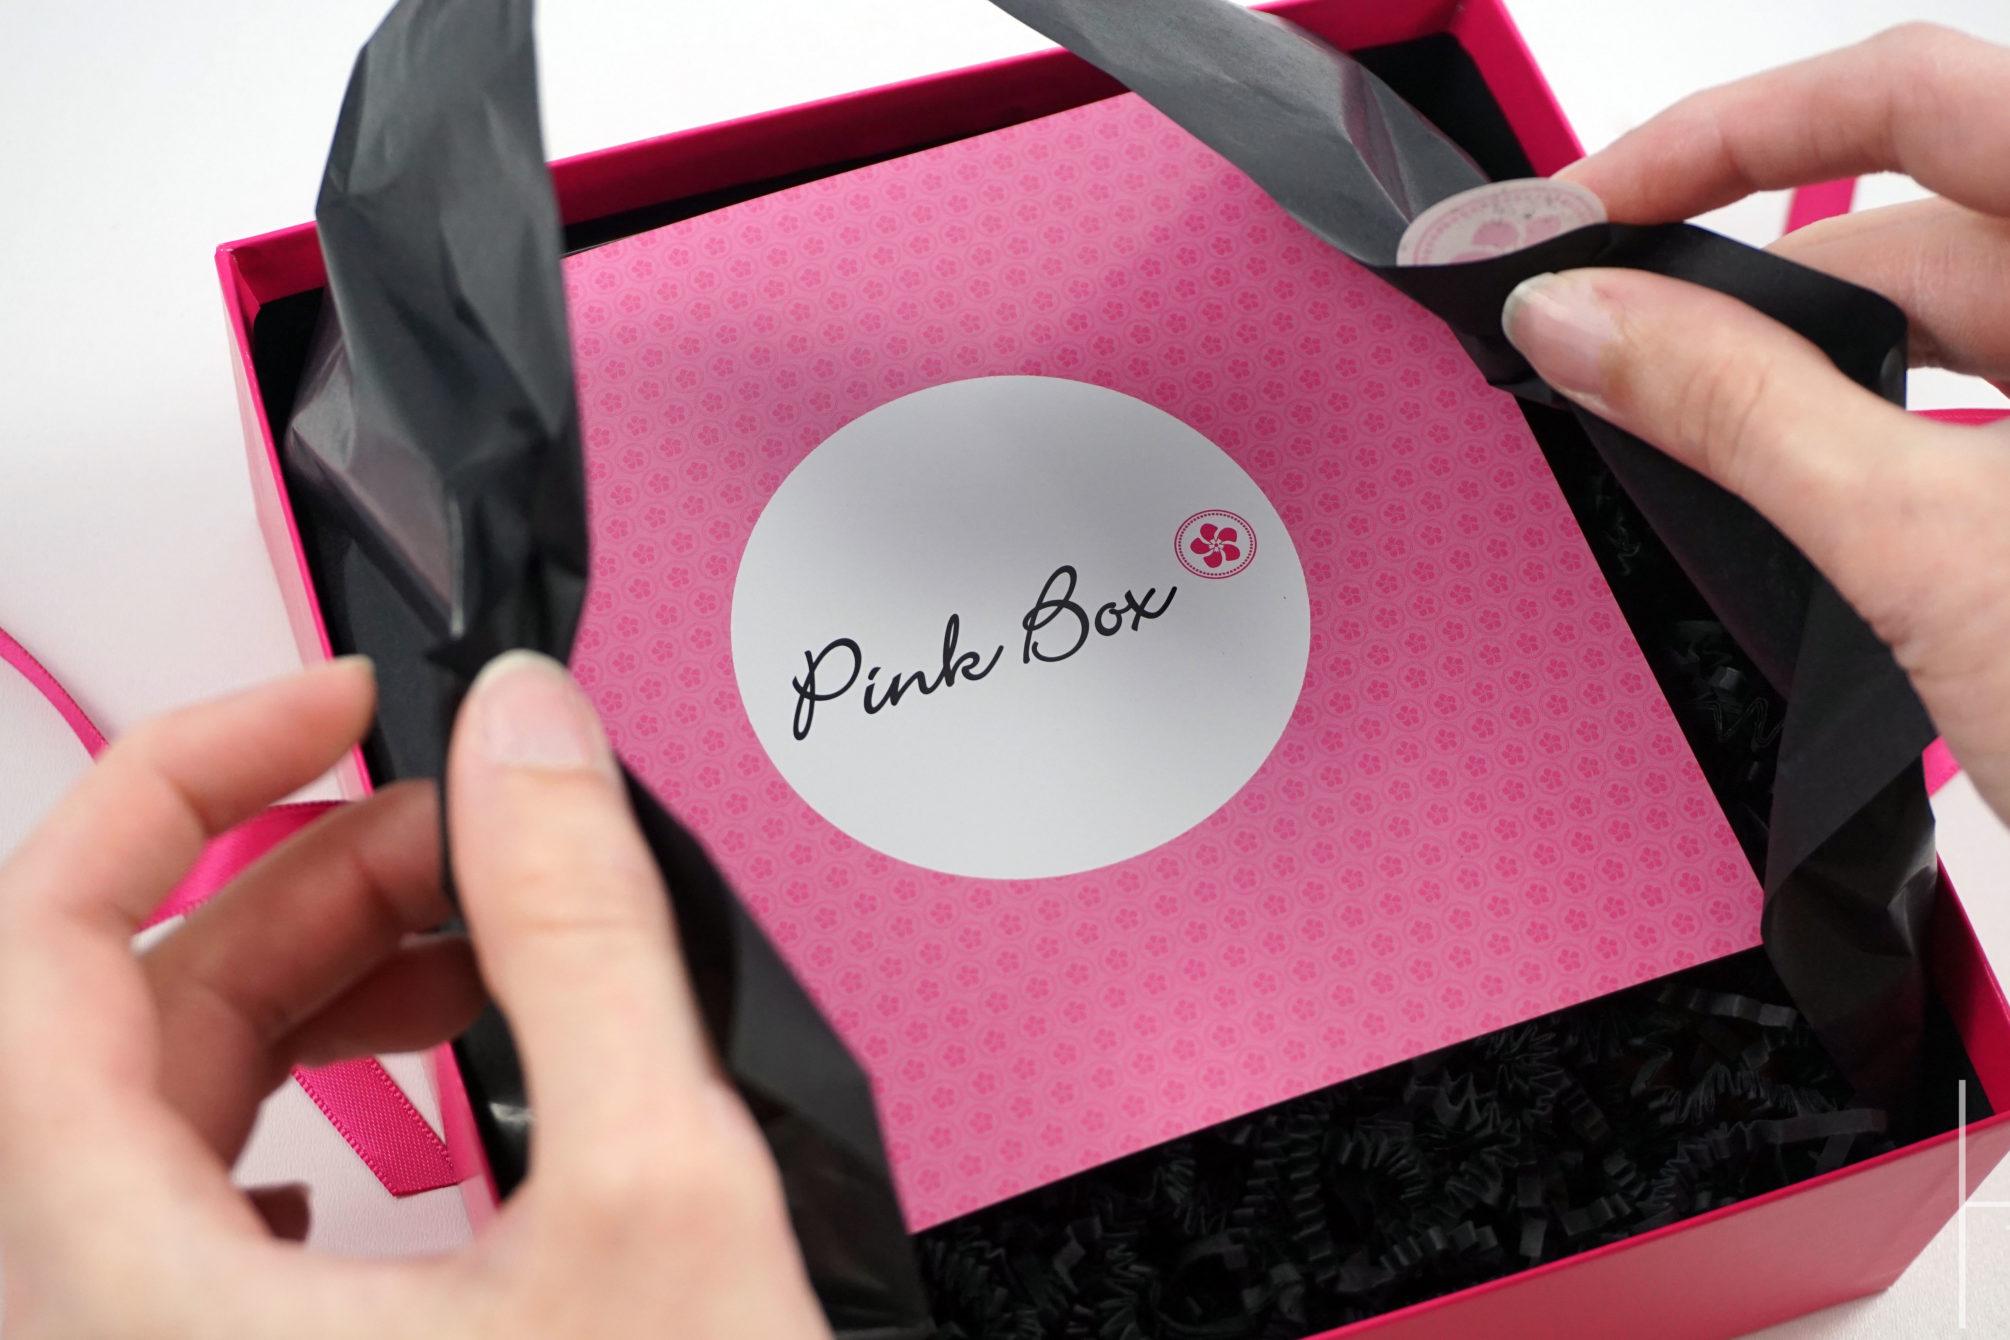 Pink Box Januar 2016